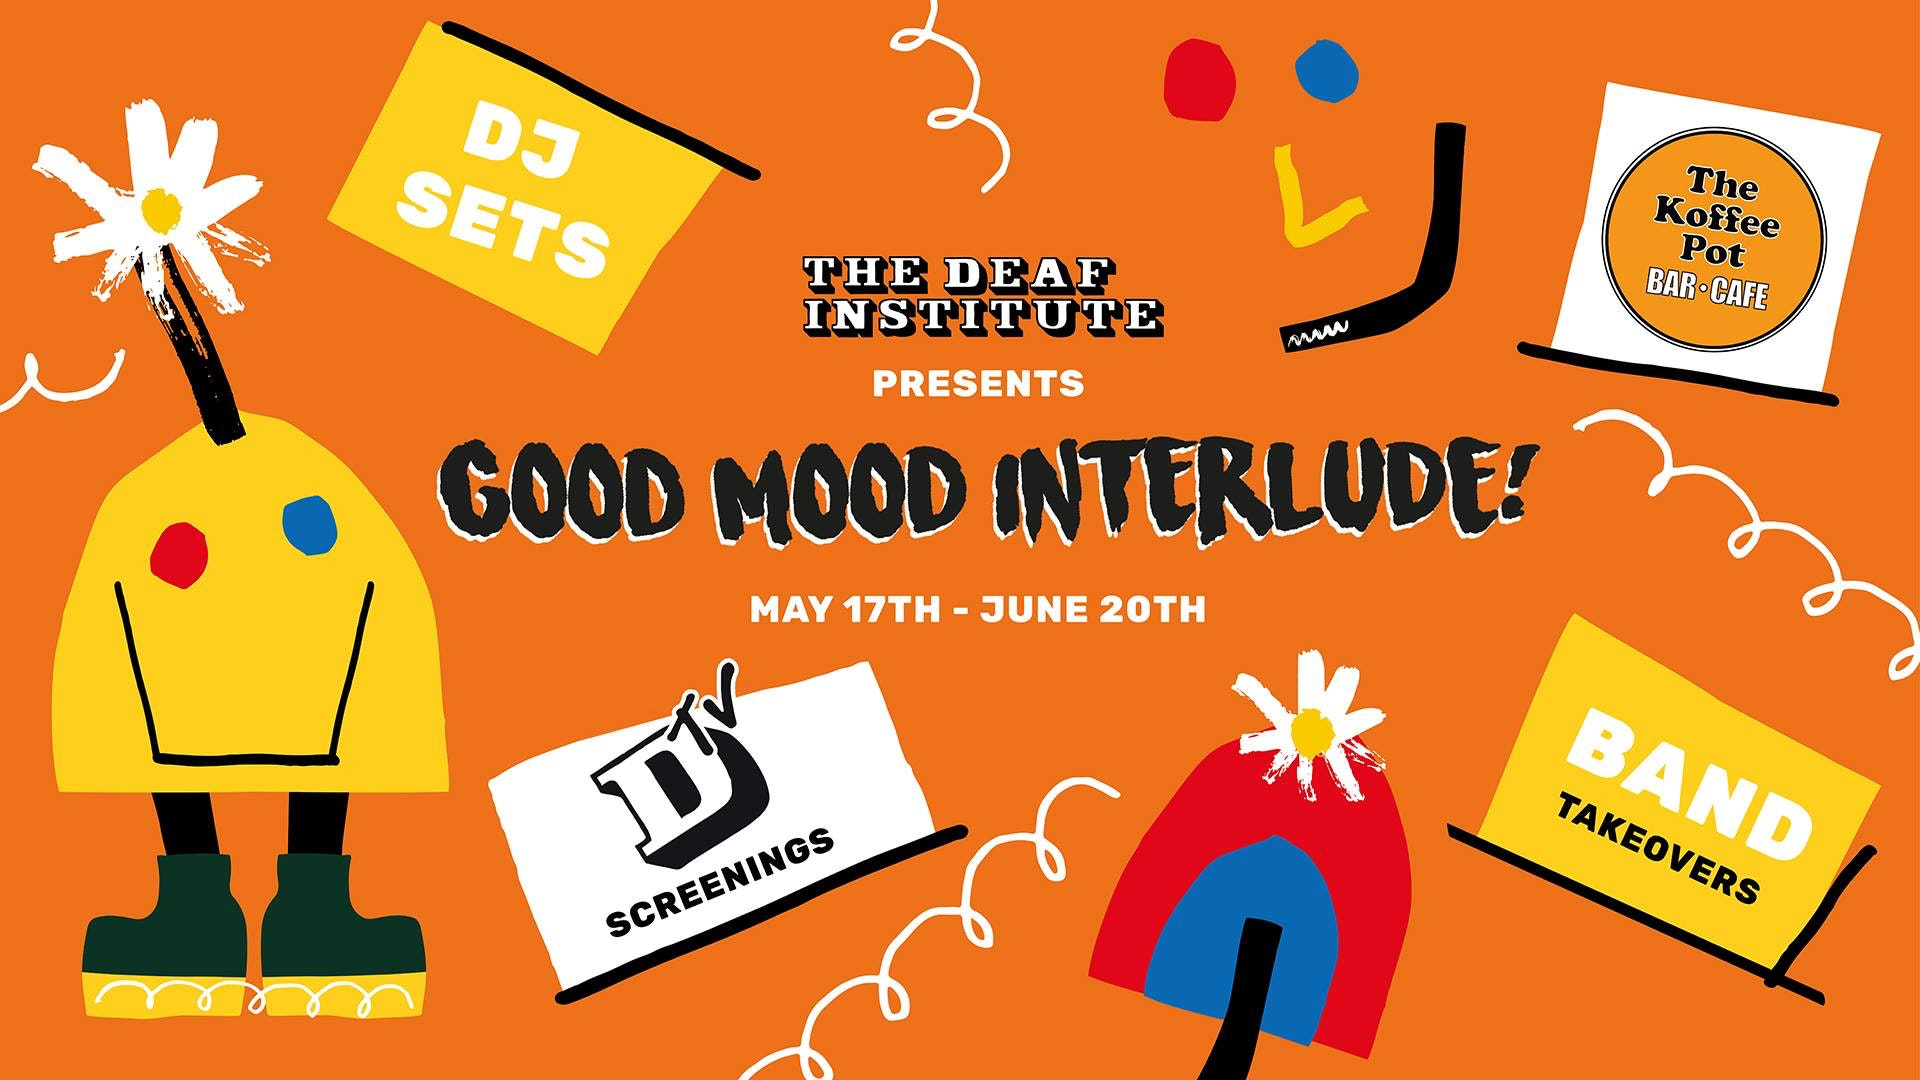 Good Mood Interlude : Presents DTV – The Mighty Boosh Screening